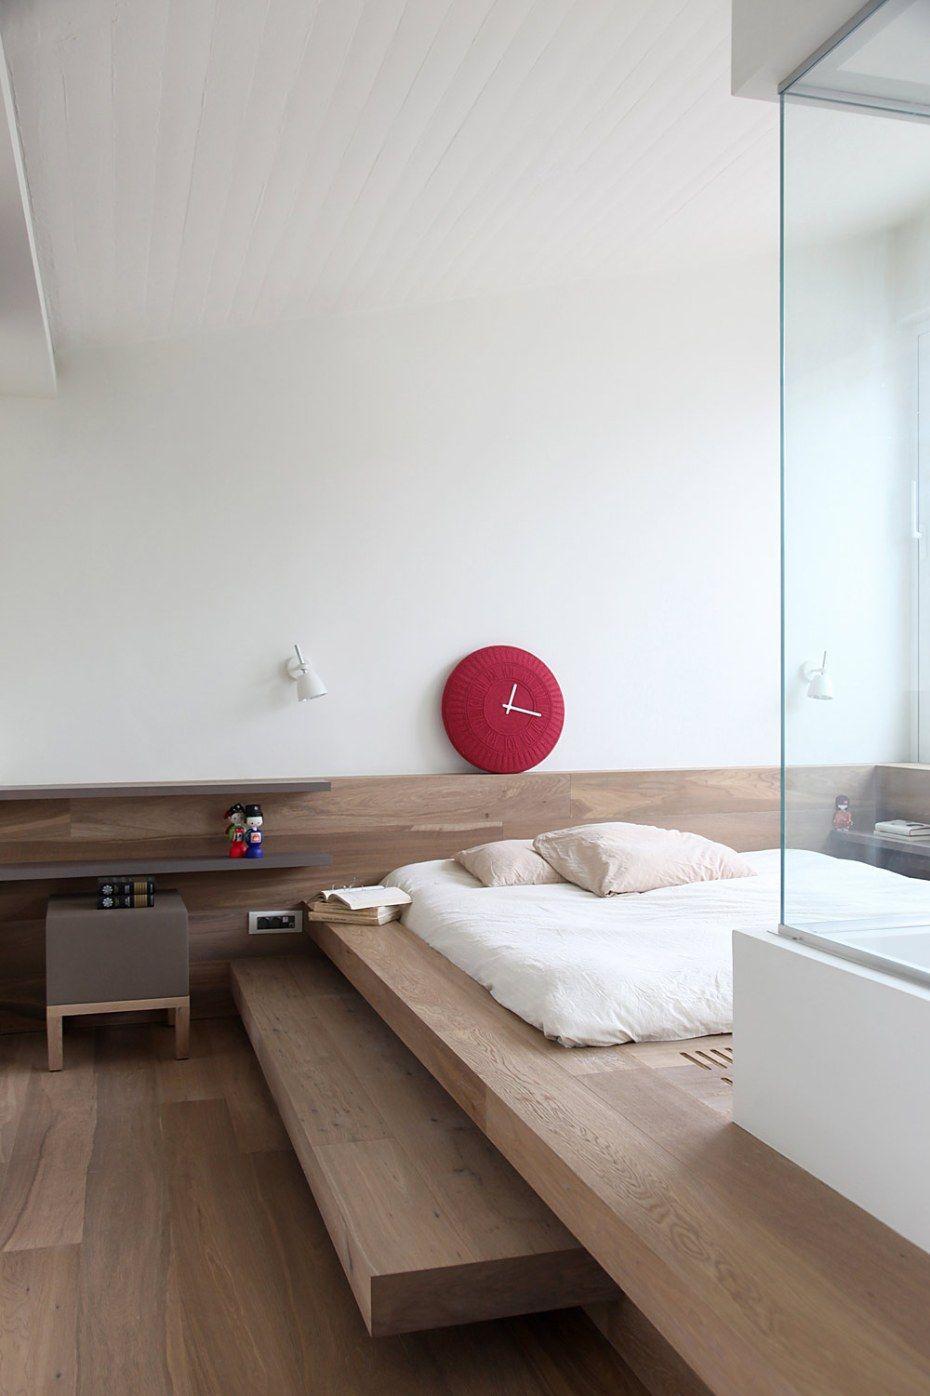 4 room bto master bedroom design  Minimalistic Penthouse With Japanese Styling  Minimalist bedroom